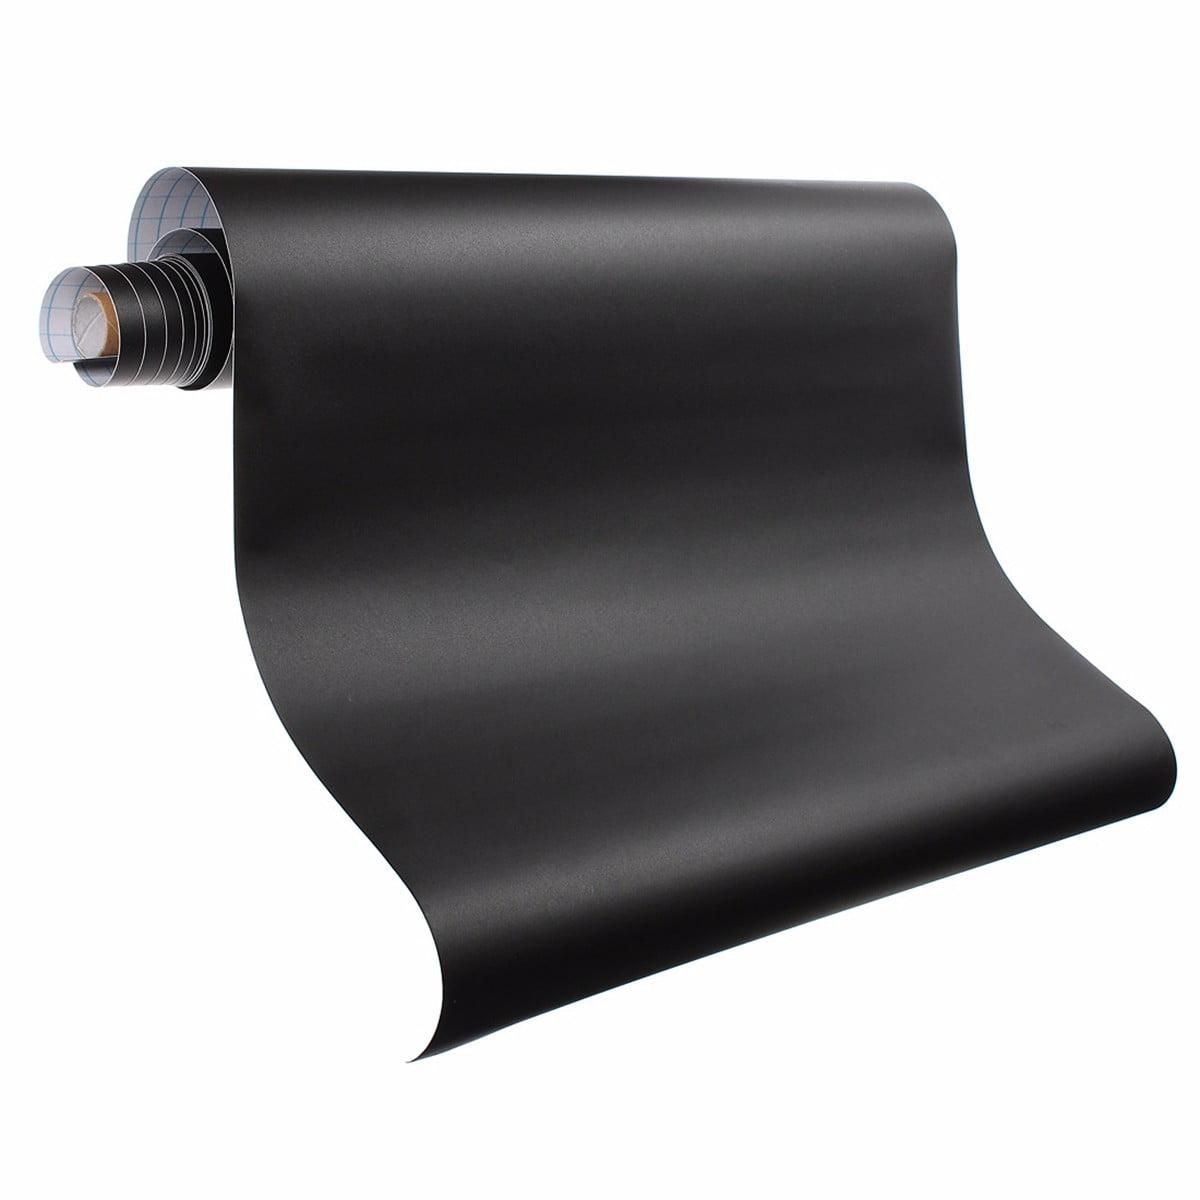 "1Pcs 78.74""x17.71"" Vinyl Blackboard Sticker Self-Adhesive Wall Sticker Wall Paper Chalkboard Contact... by"